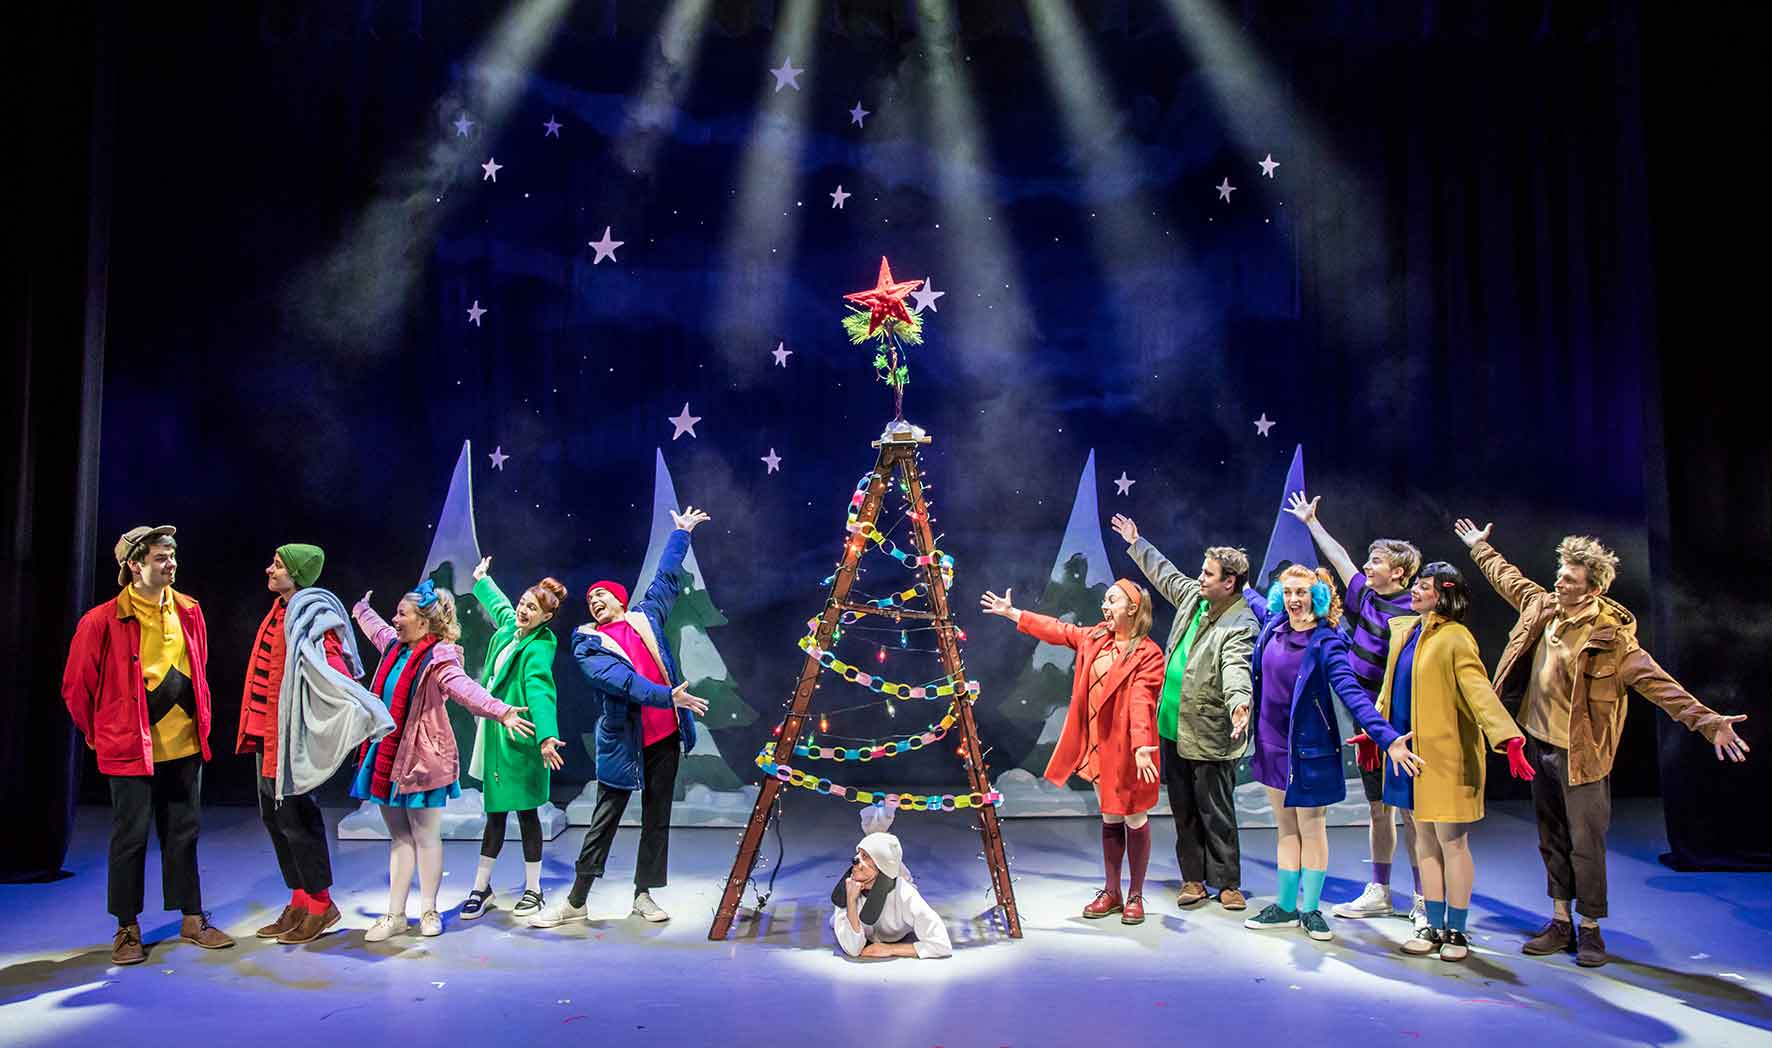 Peanuts Christmas Musical.A Charlie Brown Christmas Live On Stage Columbus